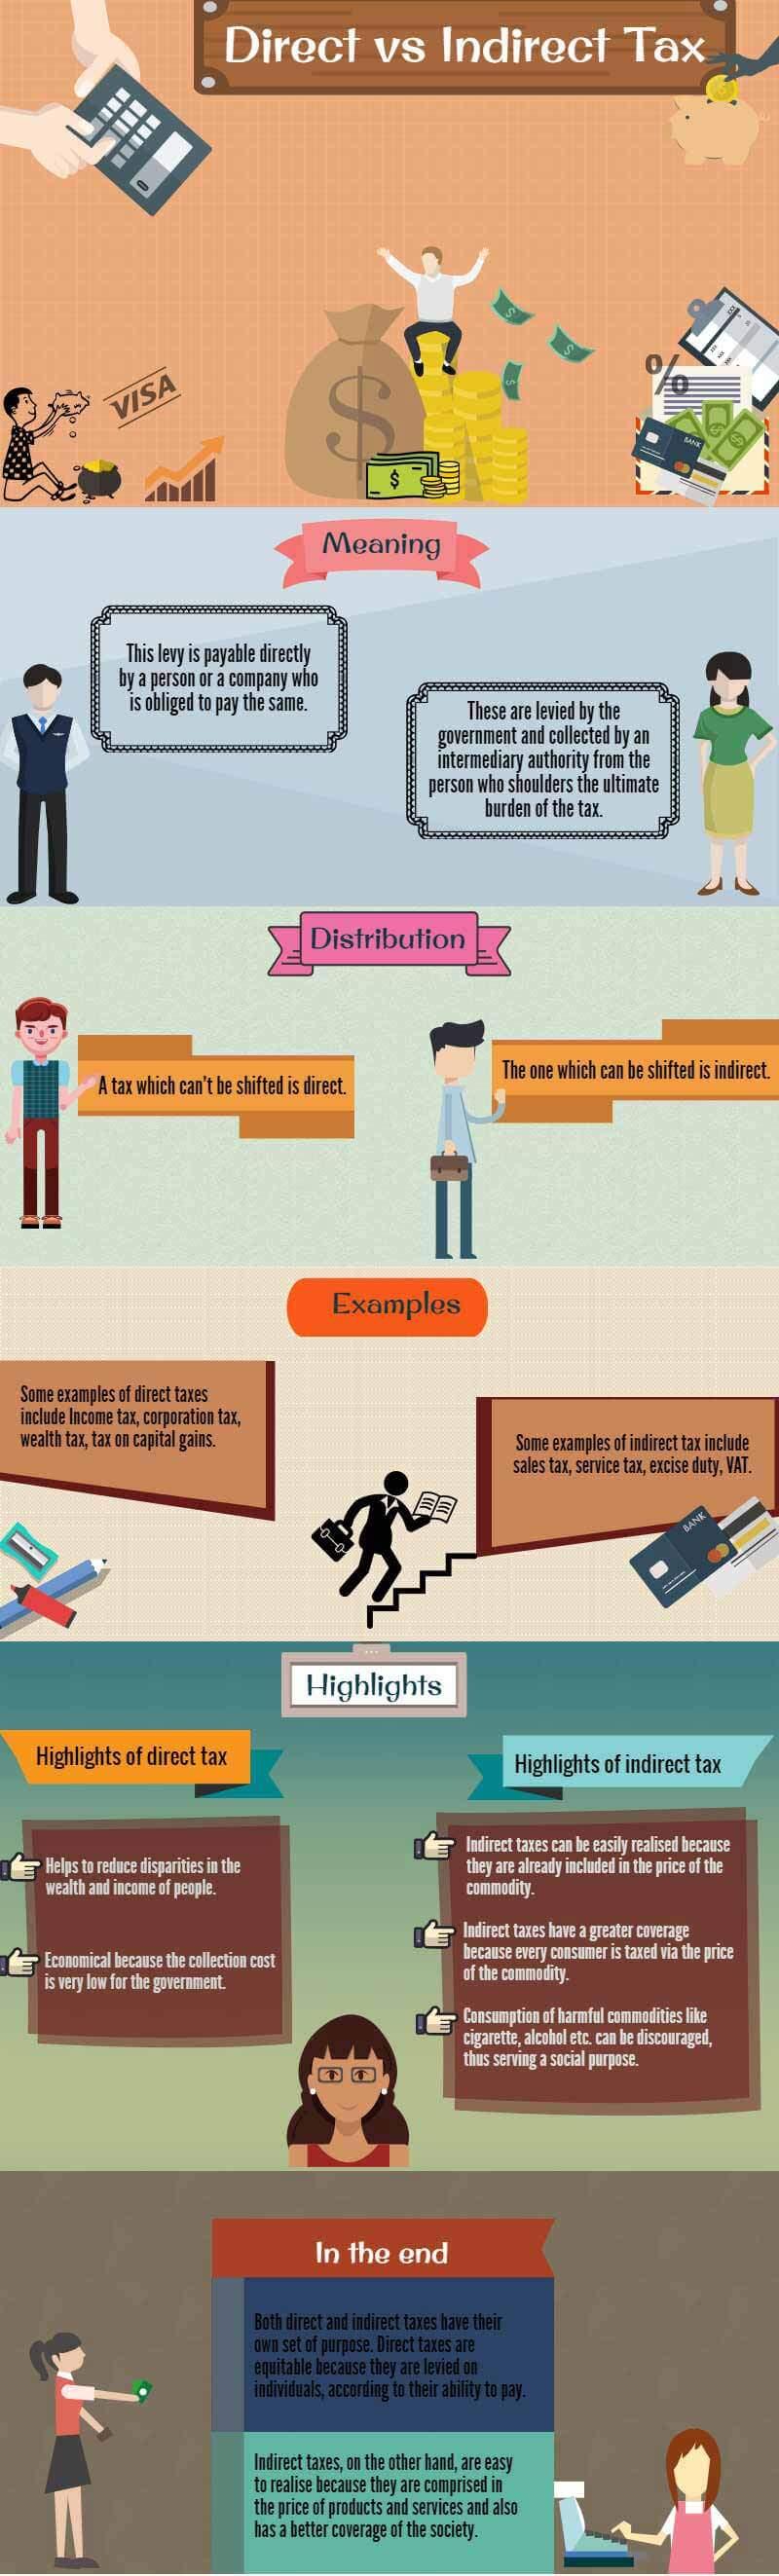 Direct vs Indirect Tax